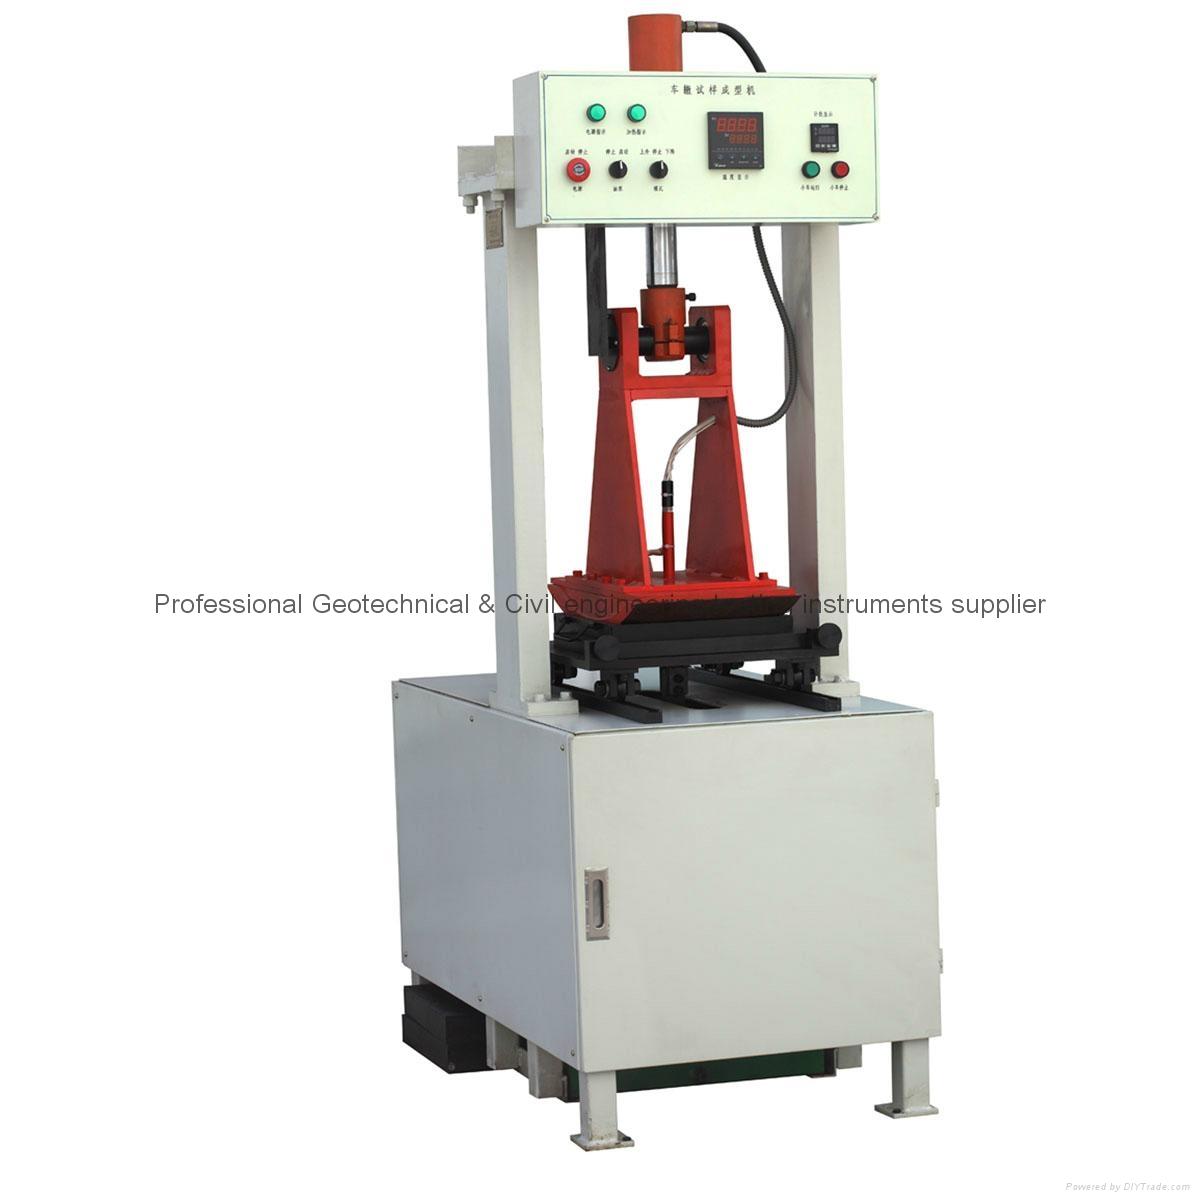 Commercial Compactor Wheel : Asphalt wheel roller compactor lcx sri china